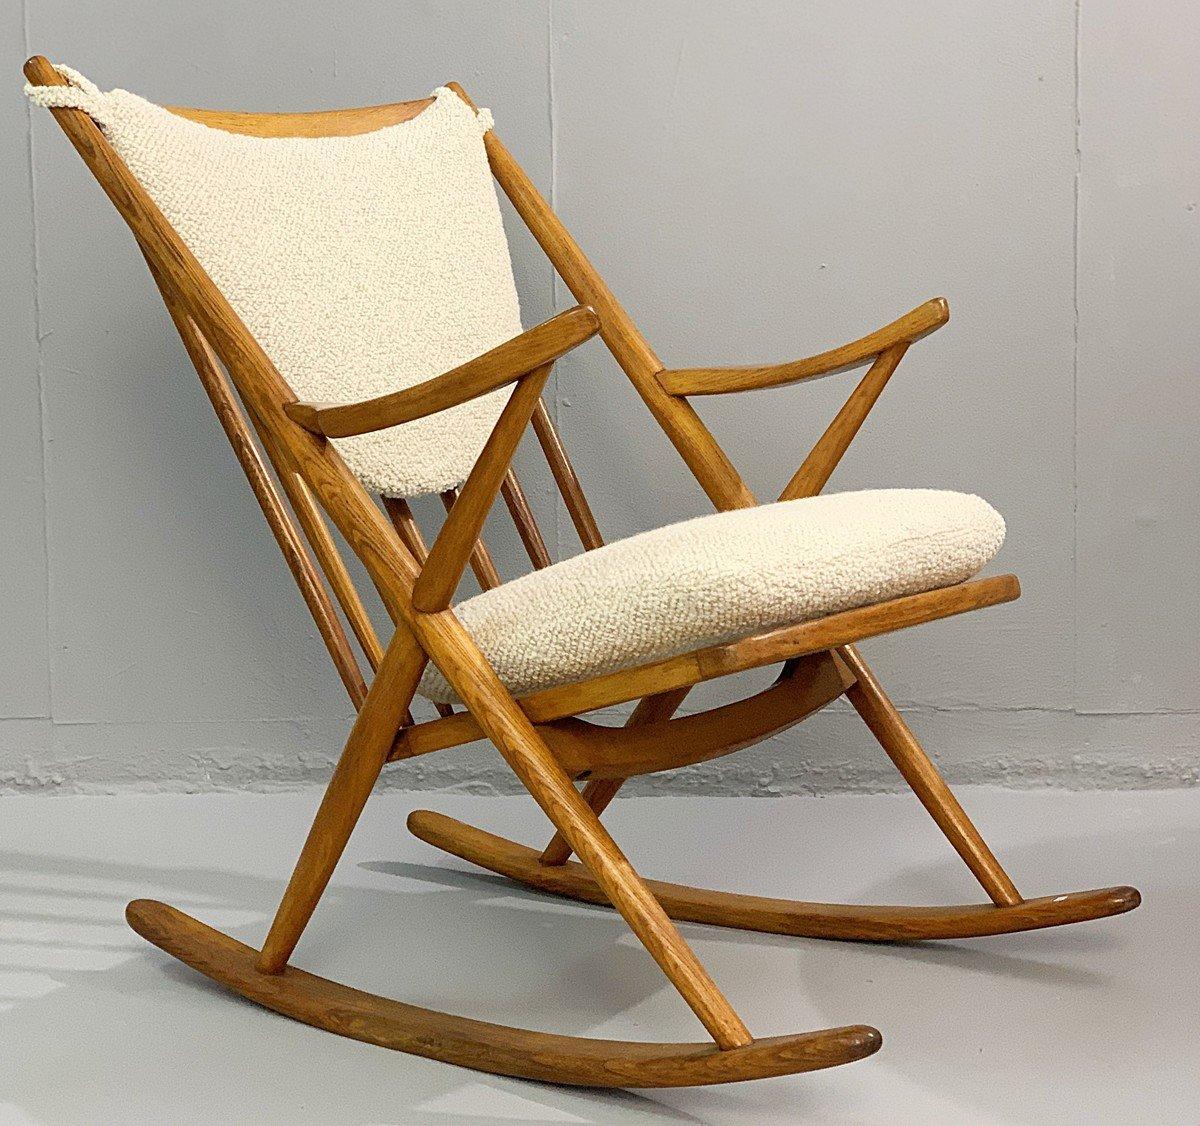 Danish Rocking Chair By Frank Reenskaug For Bramin 1960s 131871